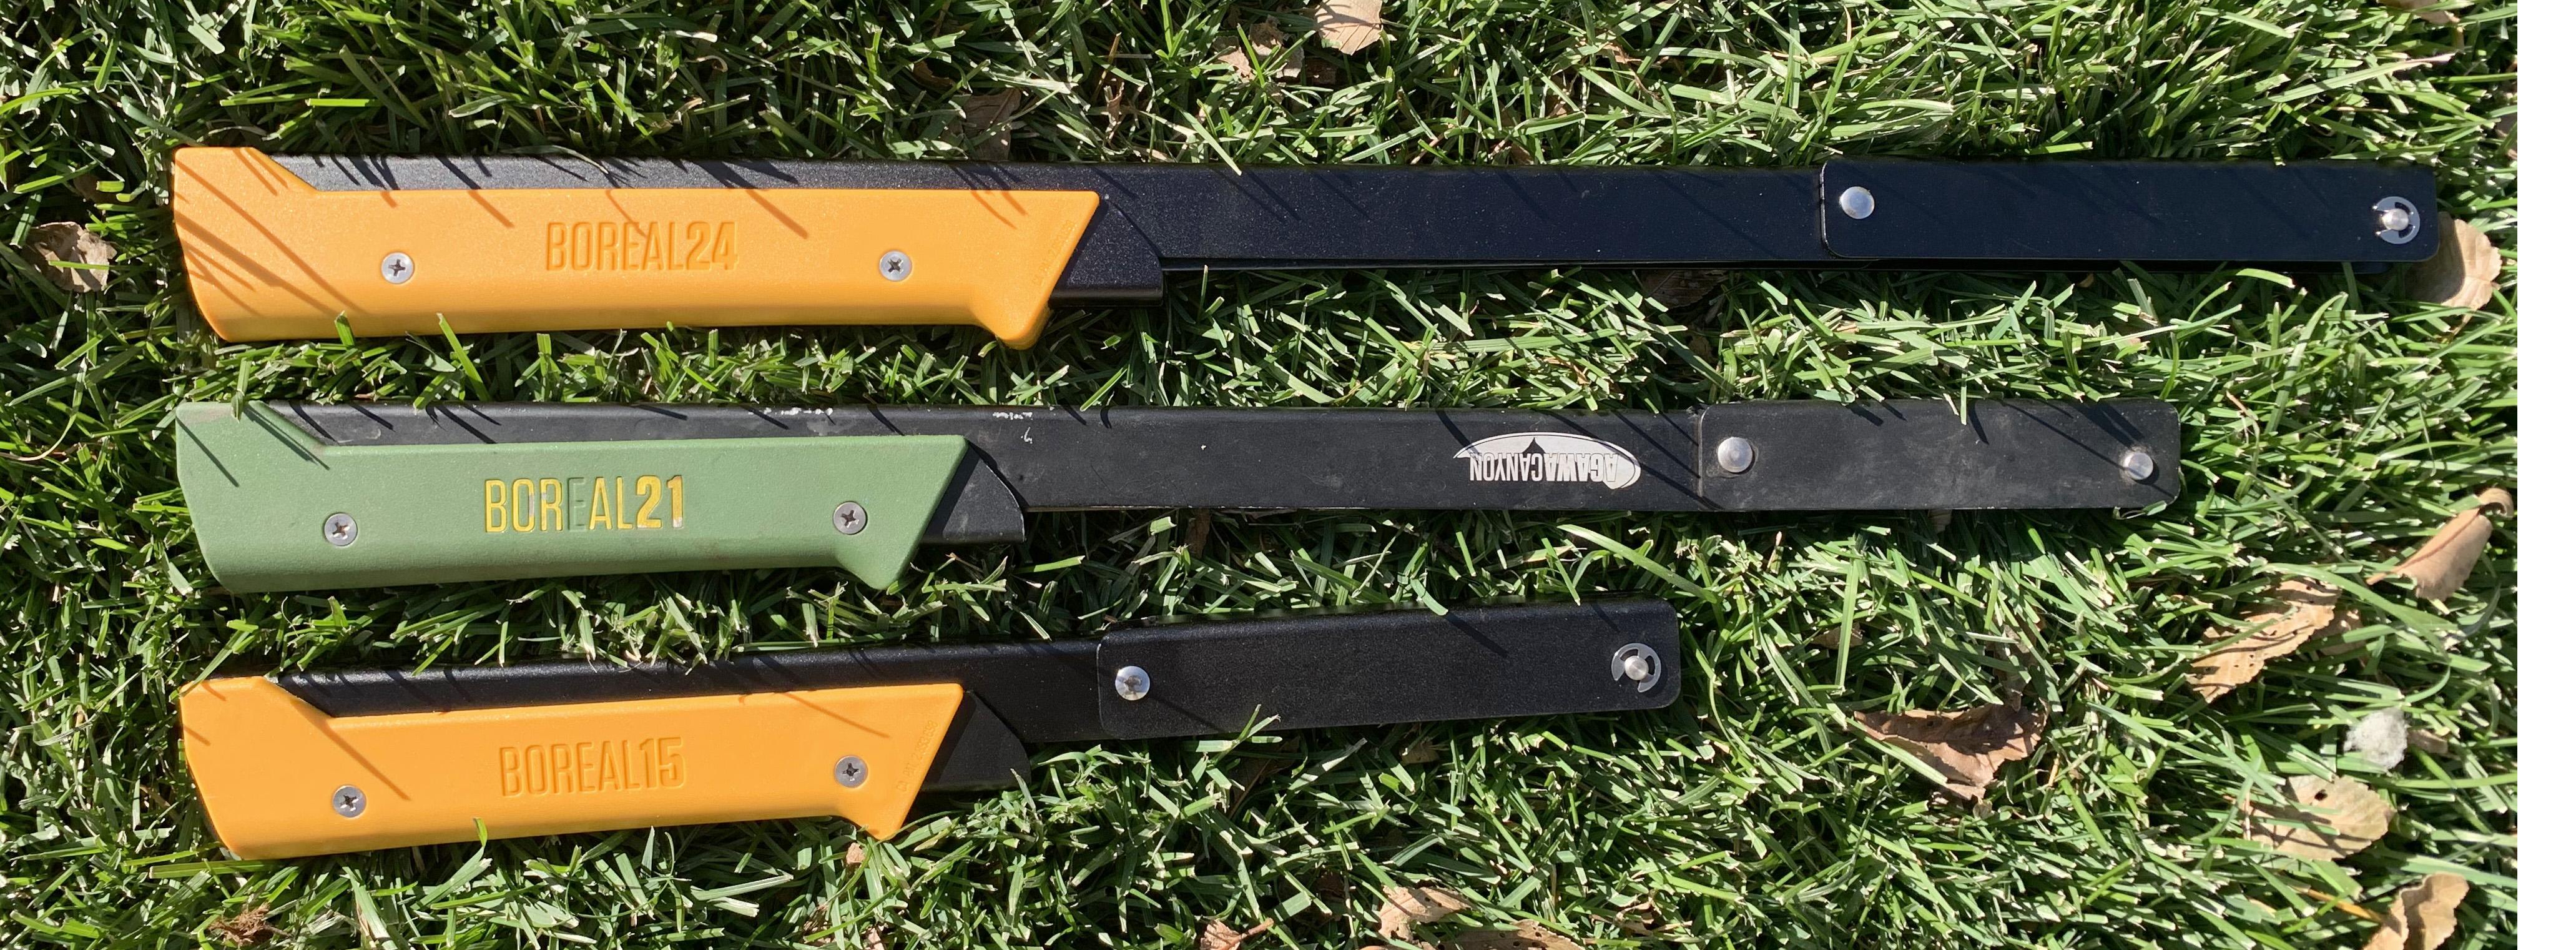 Agawa Canyon folding saws